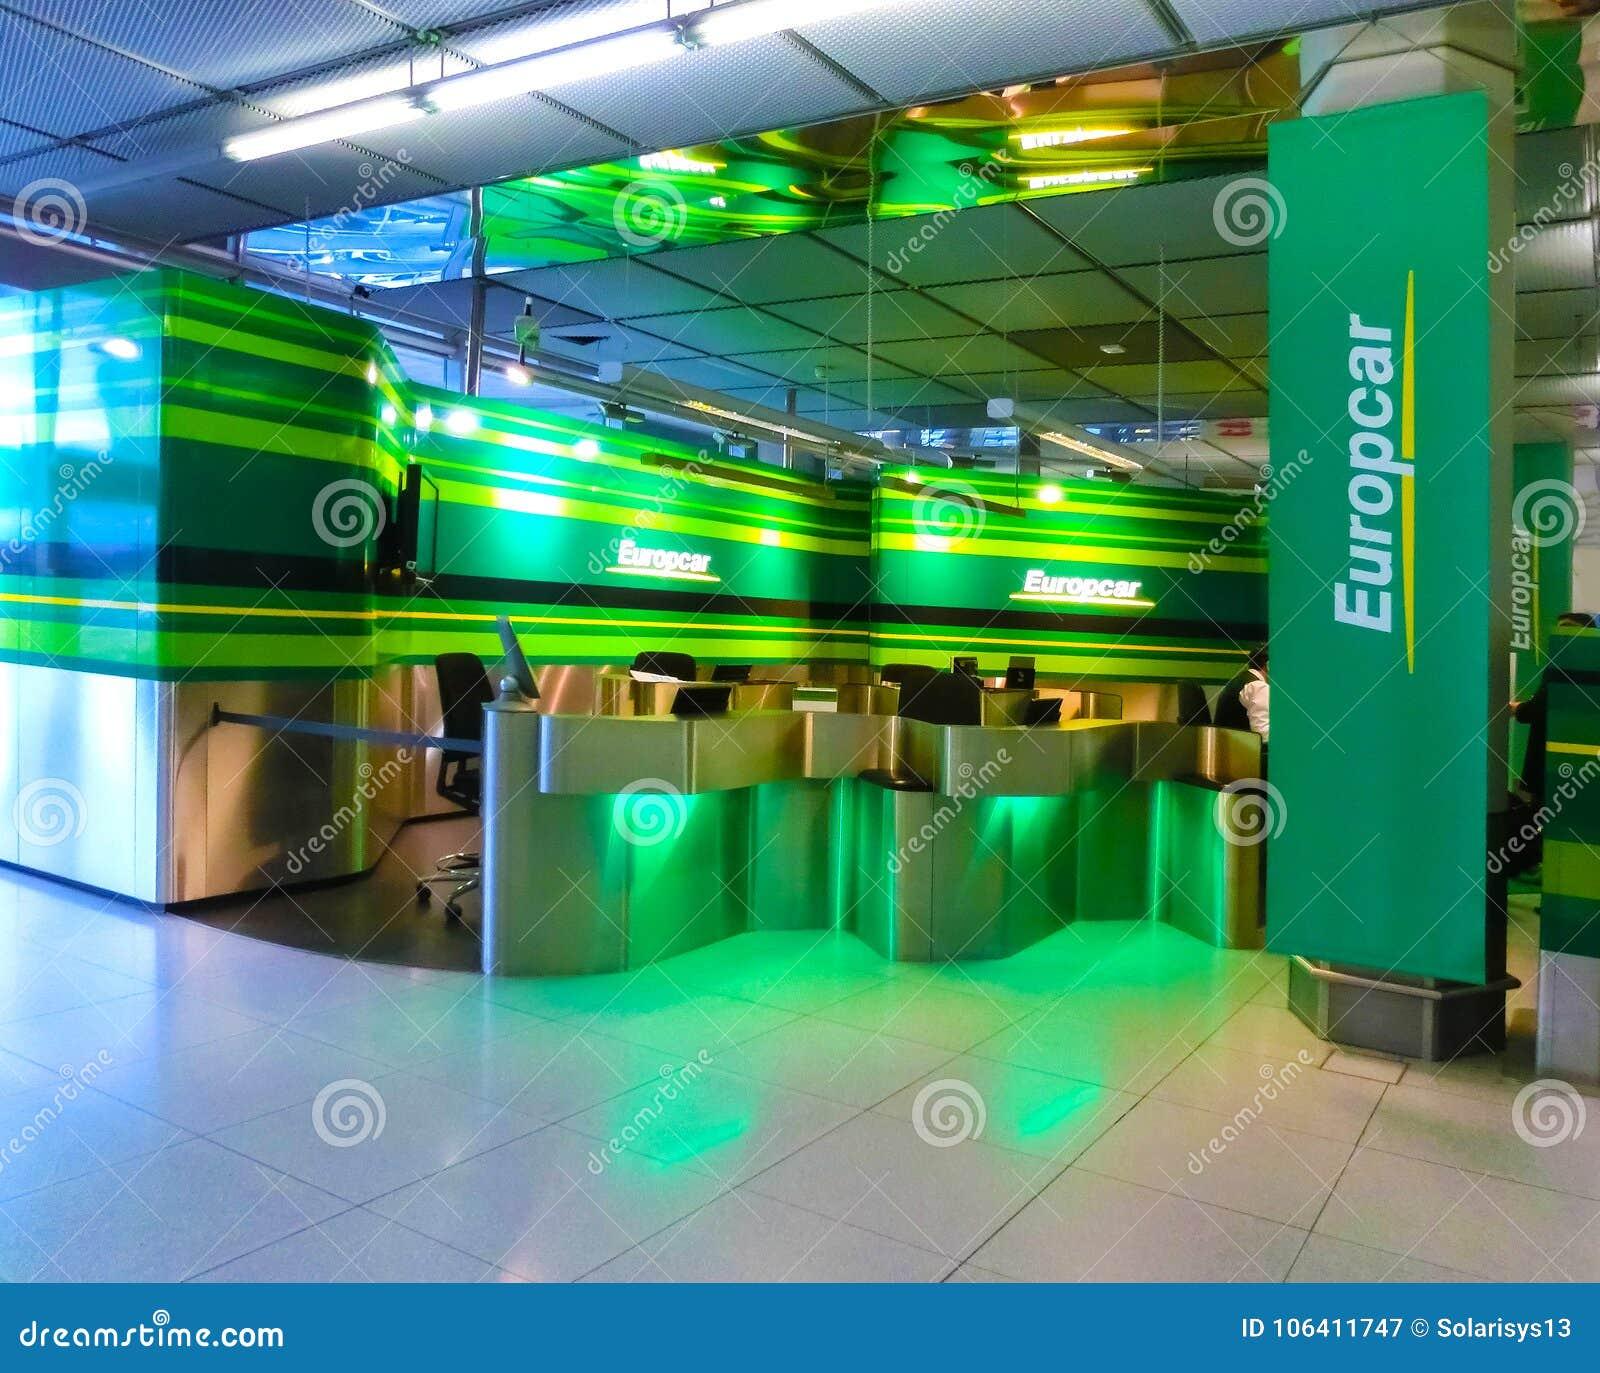 Cologne Germany December 12 2017 Europcar Car Rental Office At